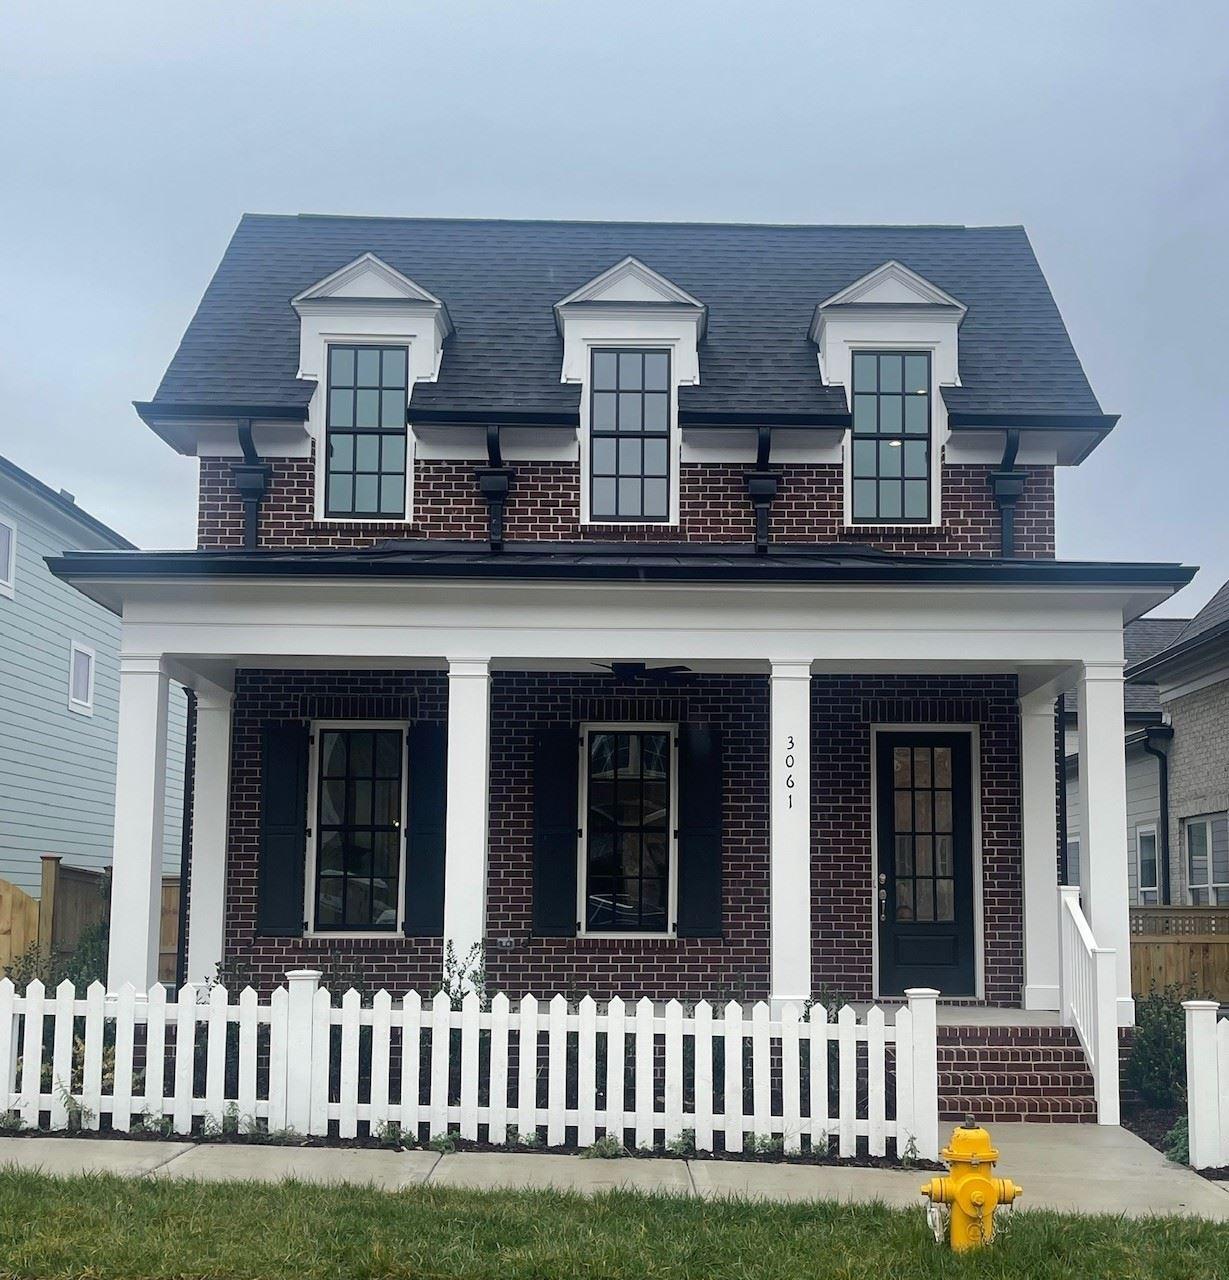 3061 Conar Street, Lot # 2202, Franklin, TN 37064 - MLS#: 2276892